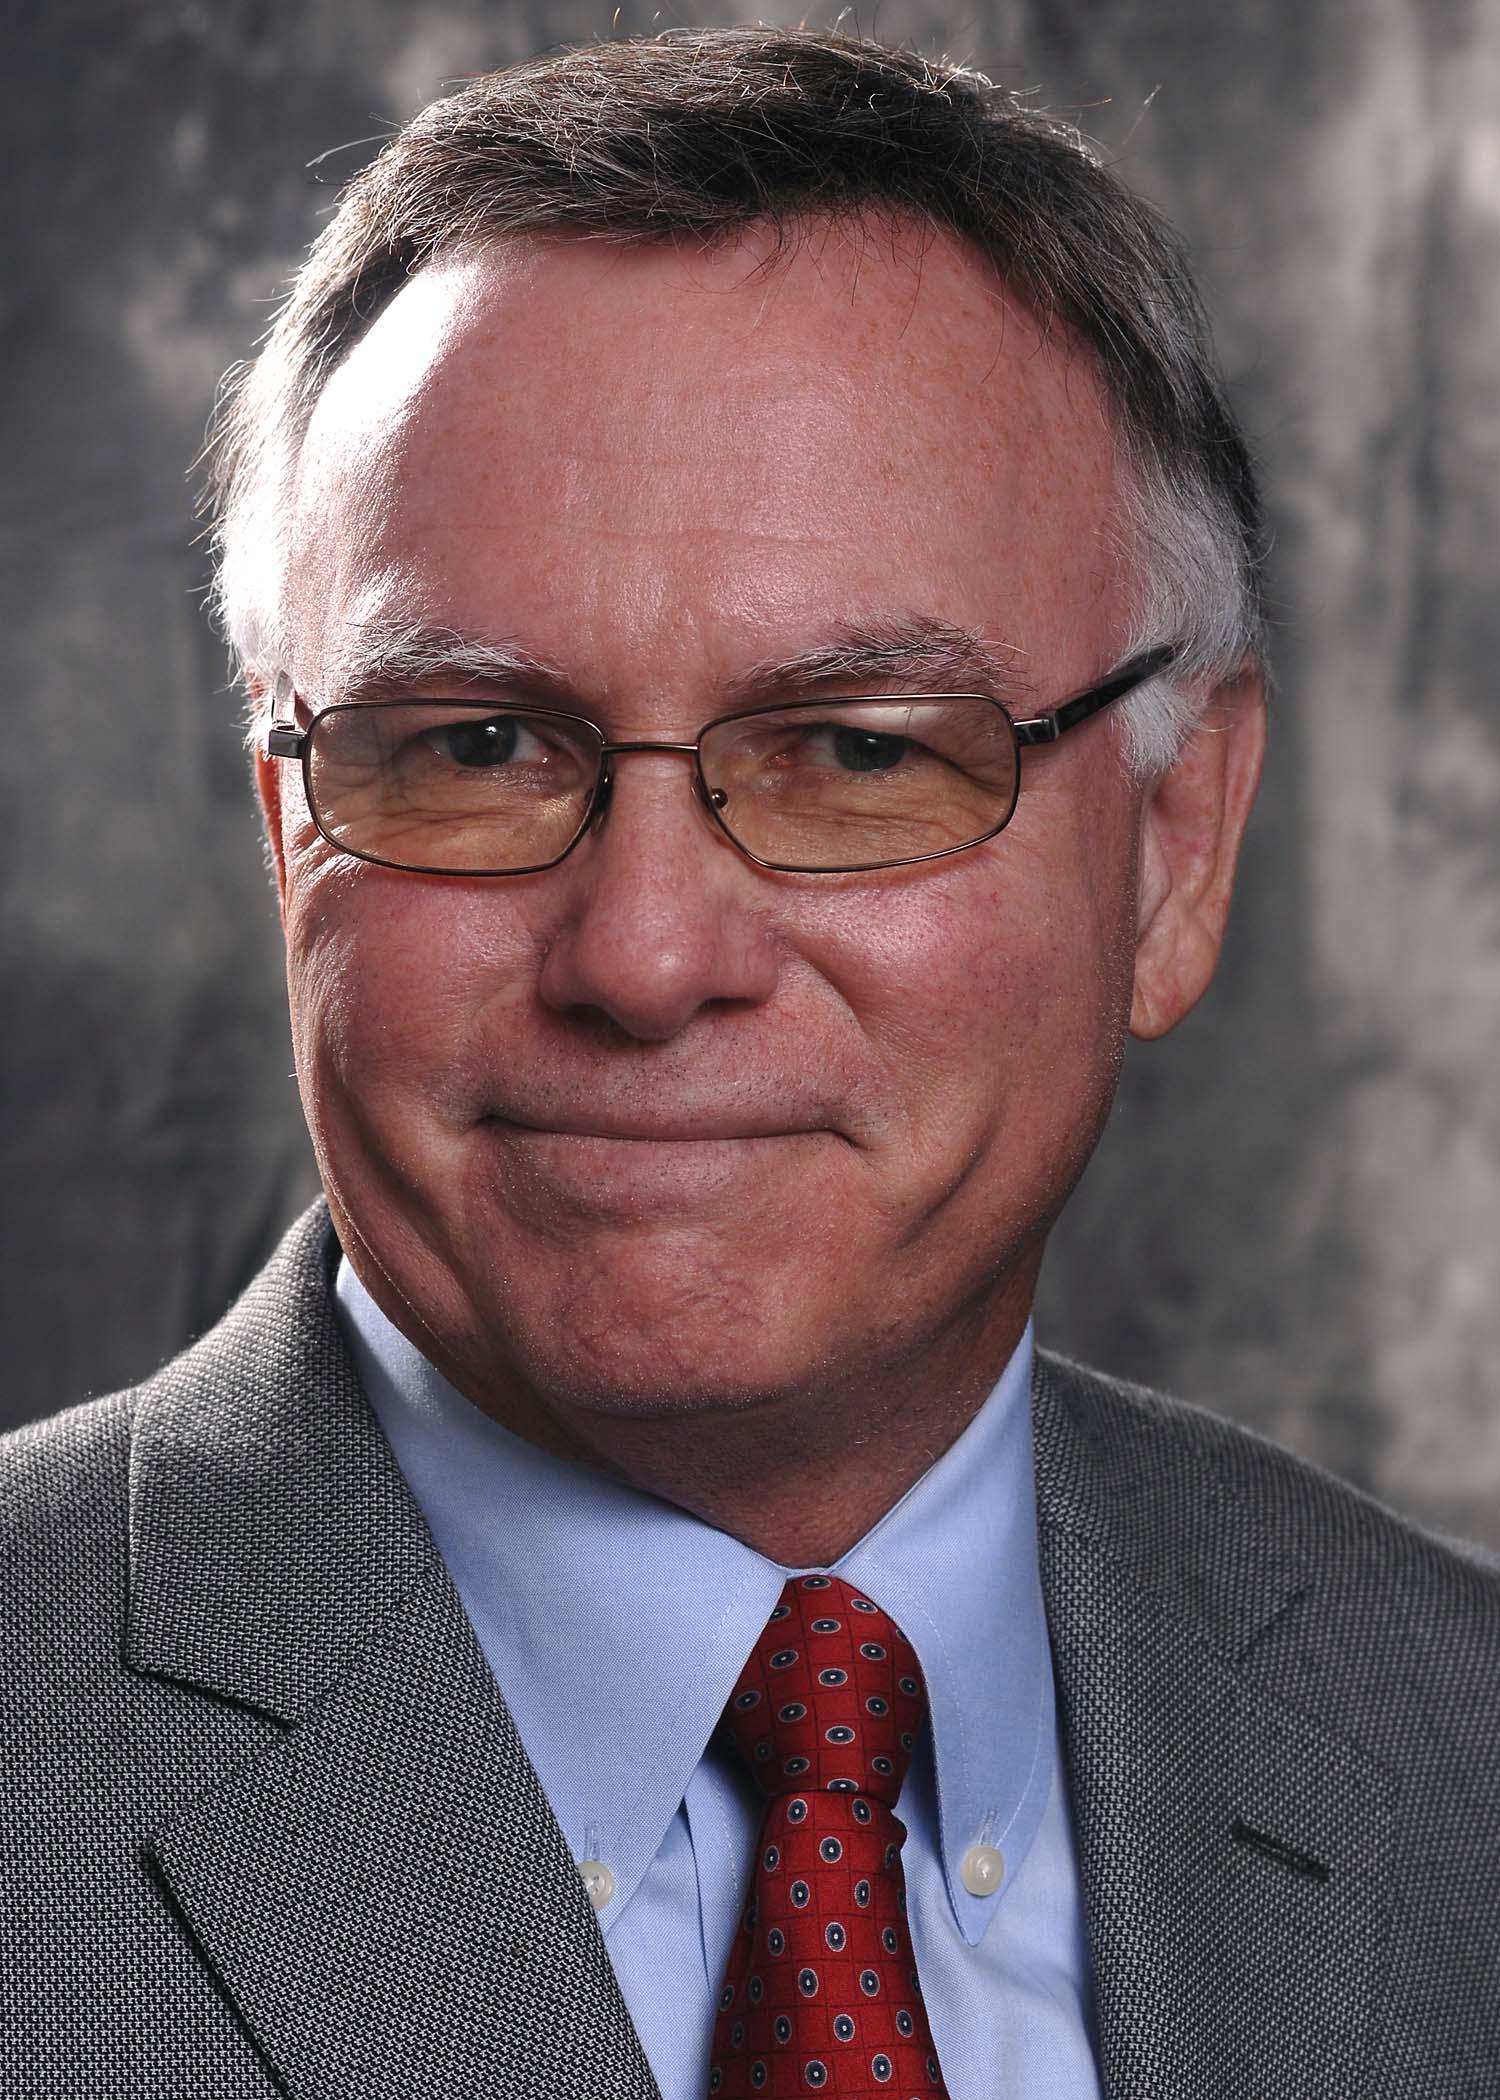 2016 NCFADS Winter School Speaker, Robert Ackerman, Ph.D.